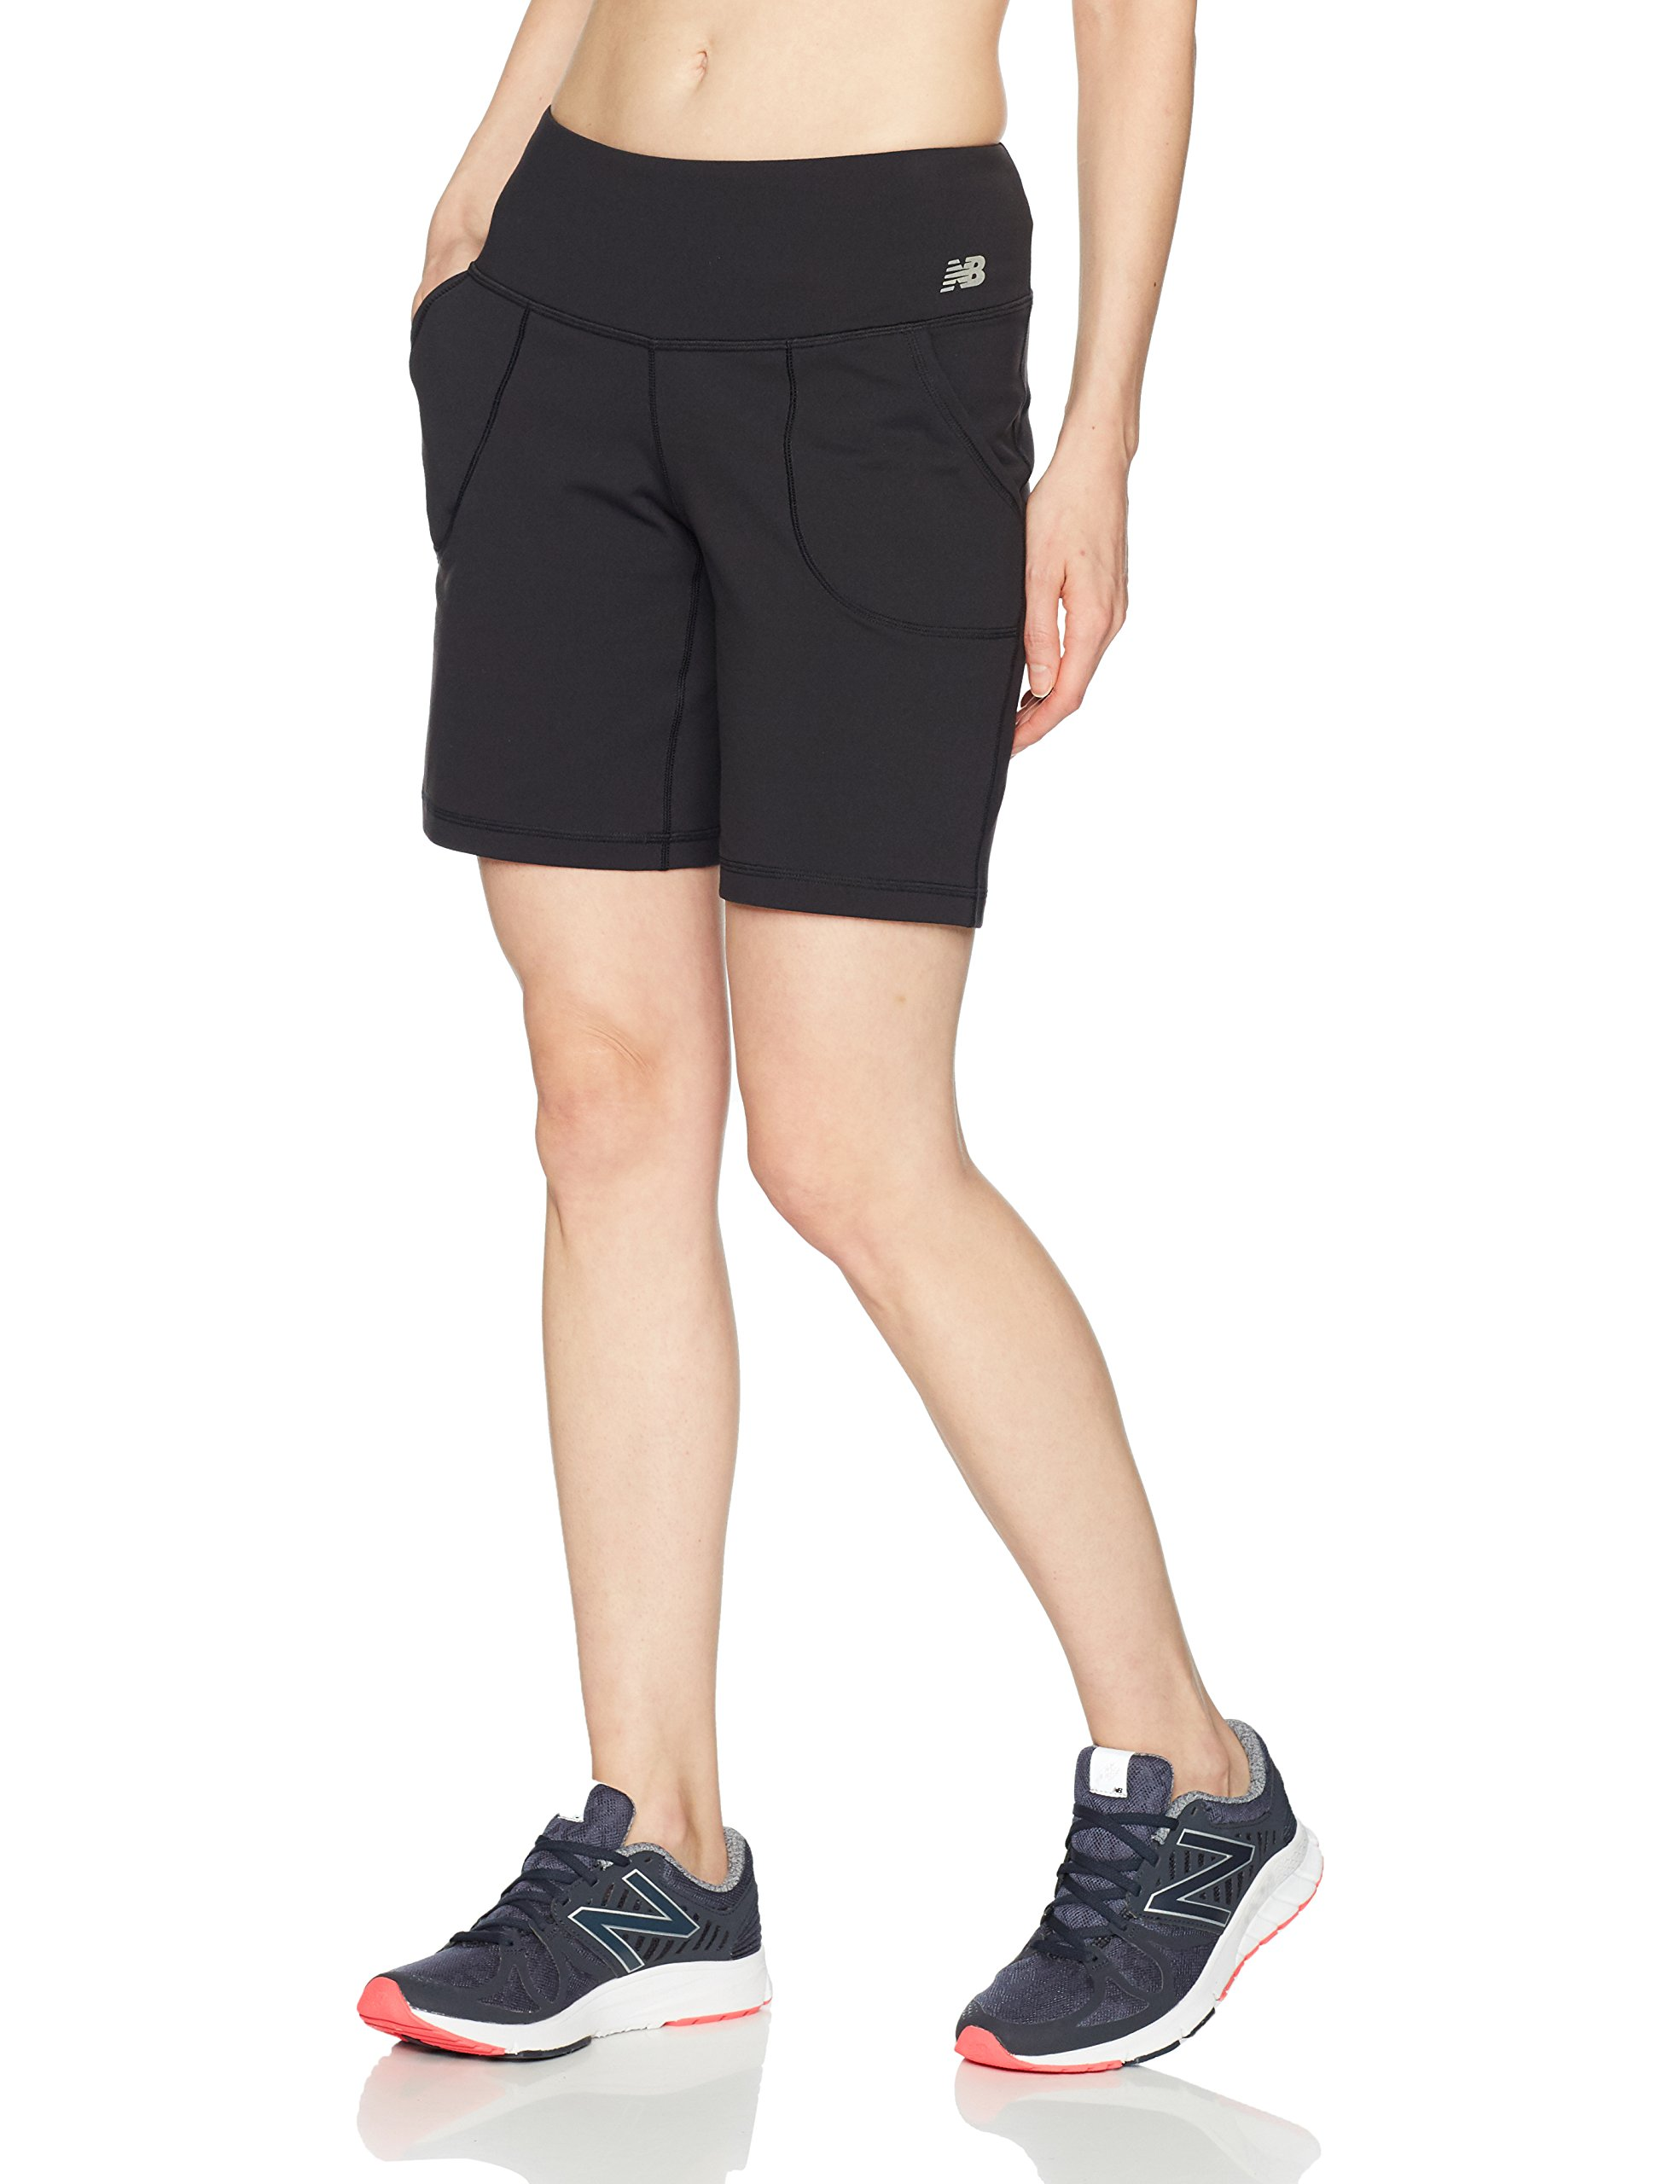 New Balance Women's Premium Performance 8-Inch Shorts, Black, Medium by New Balance